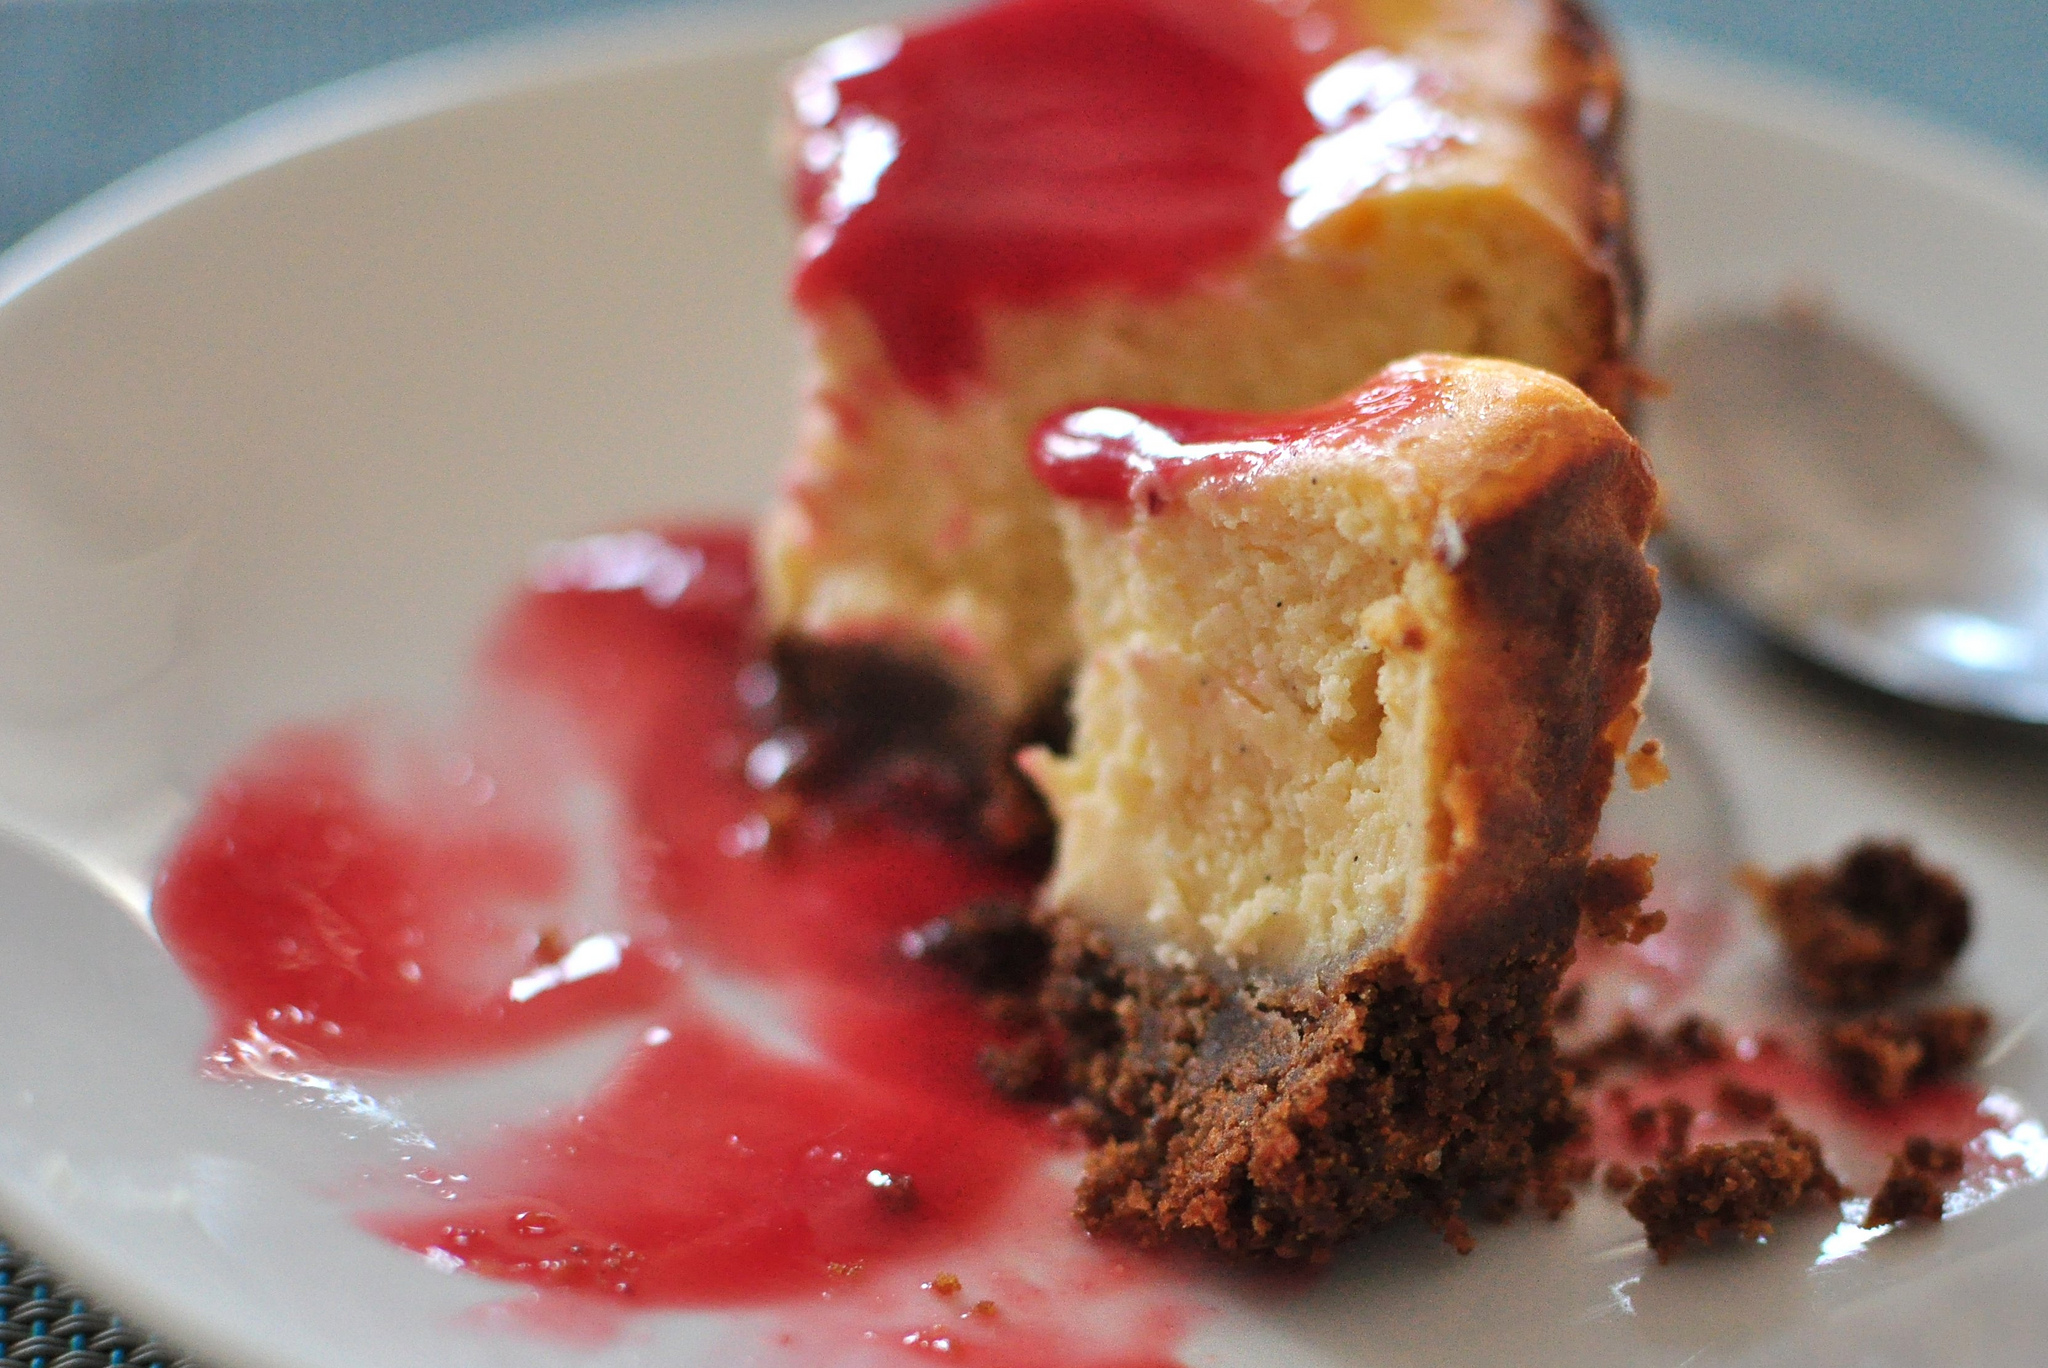 Cheesecake | © Frédérique Voisin-Demery/Flickr